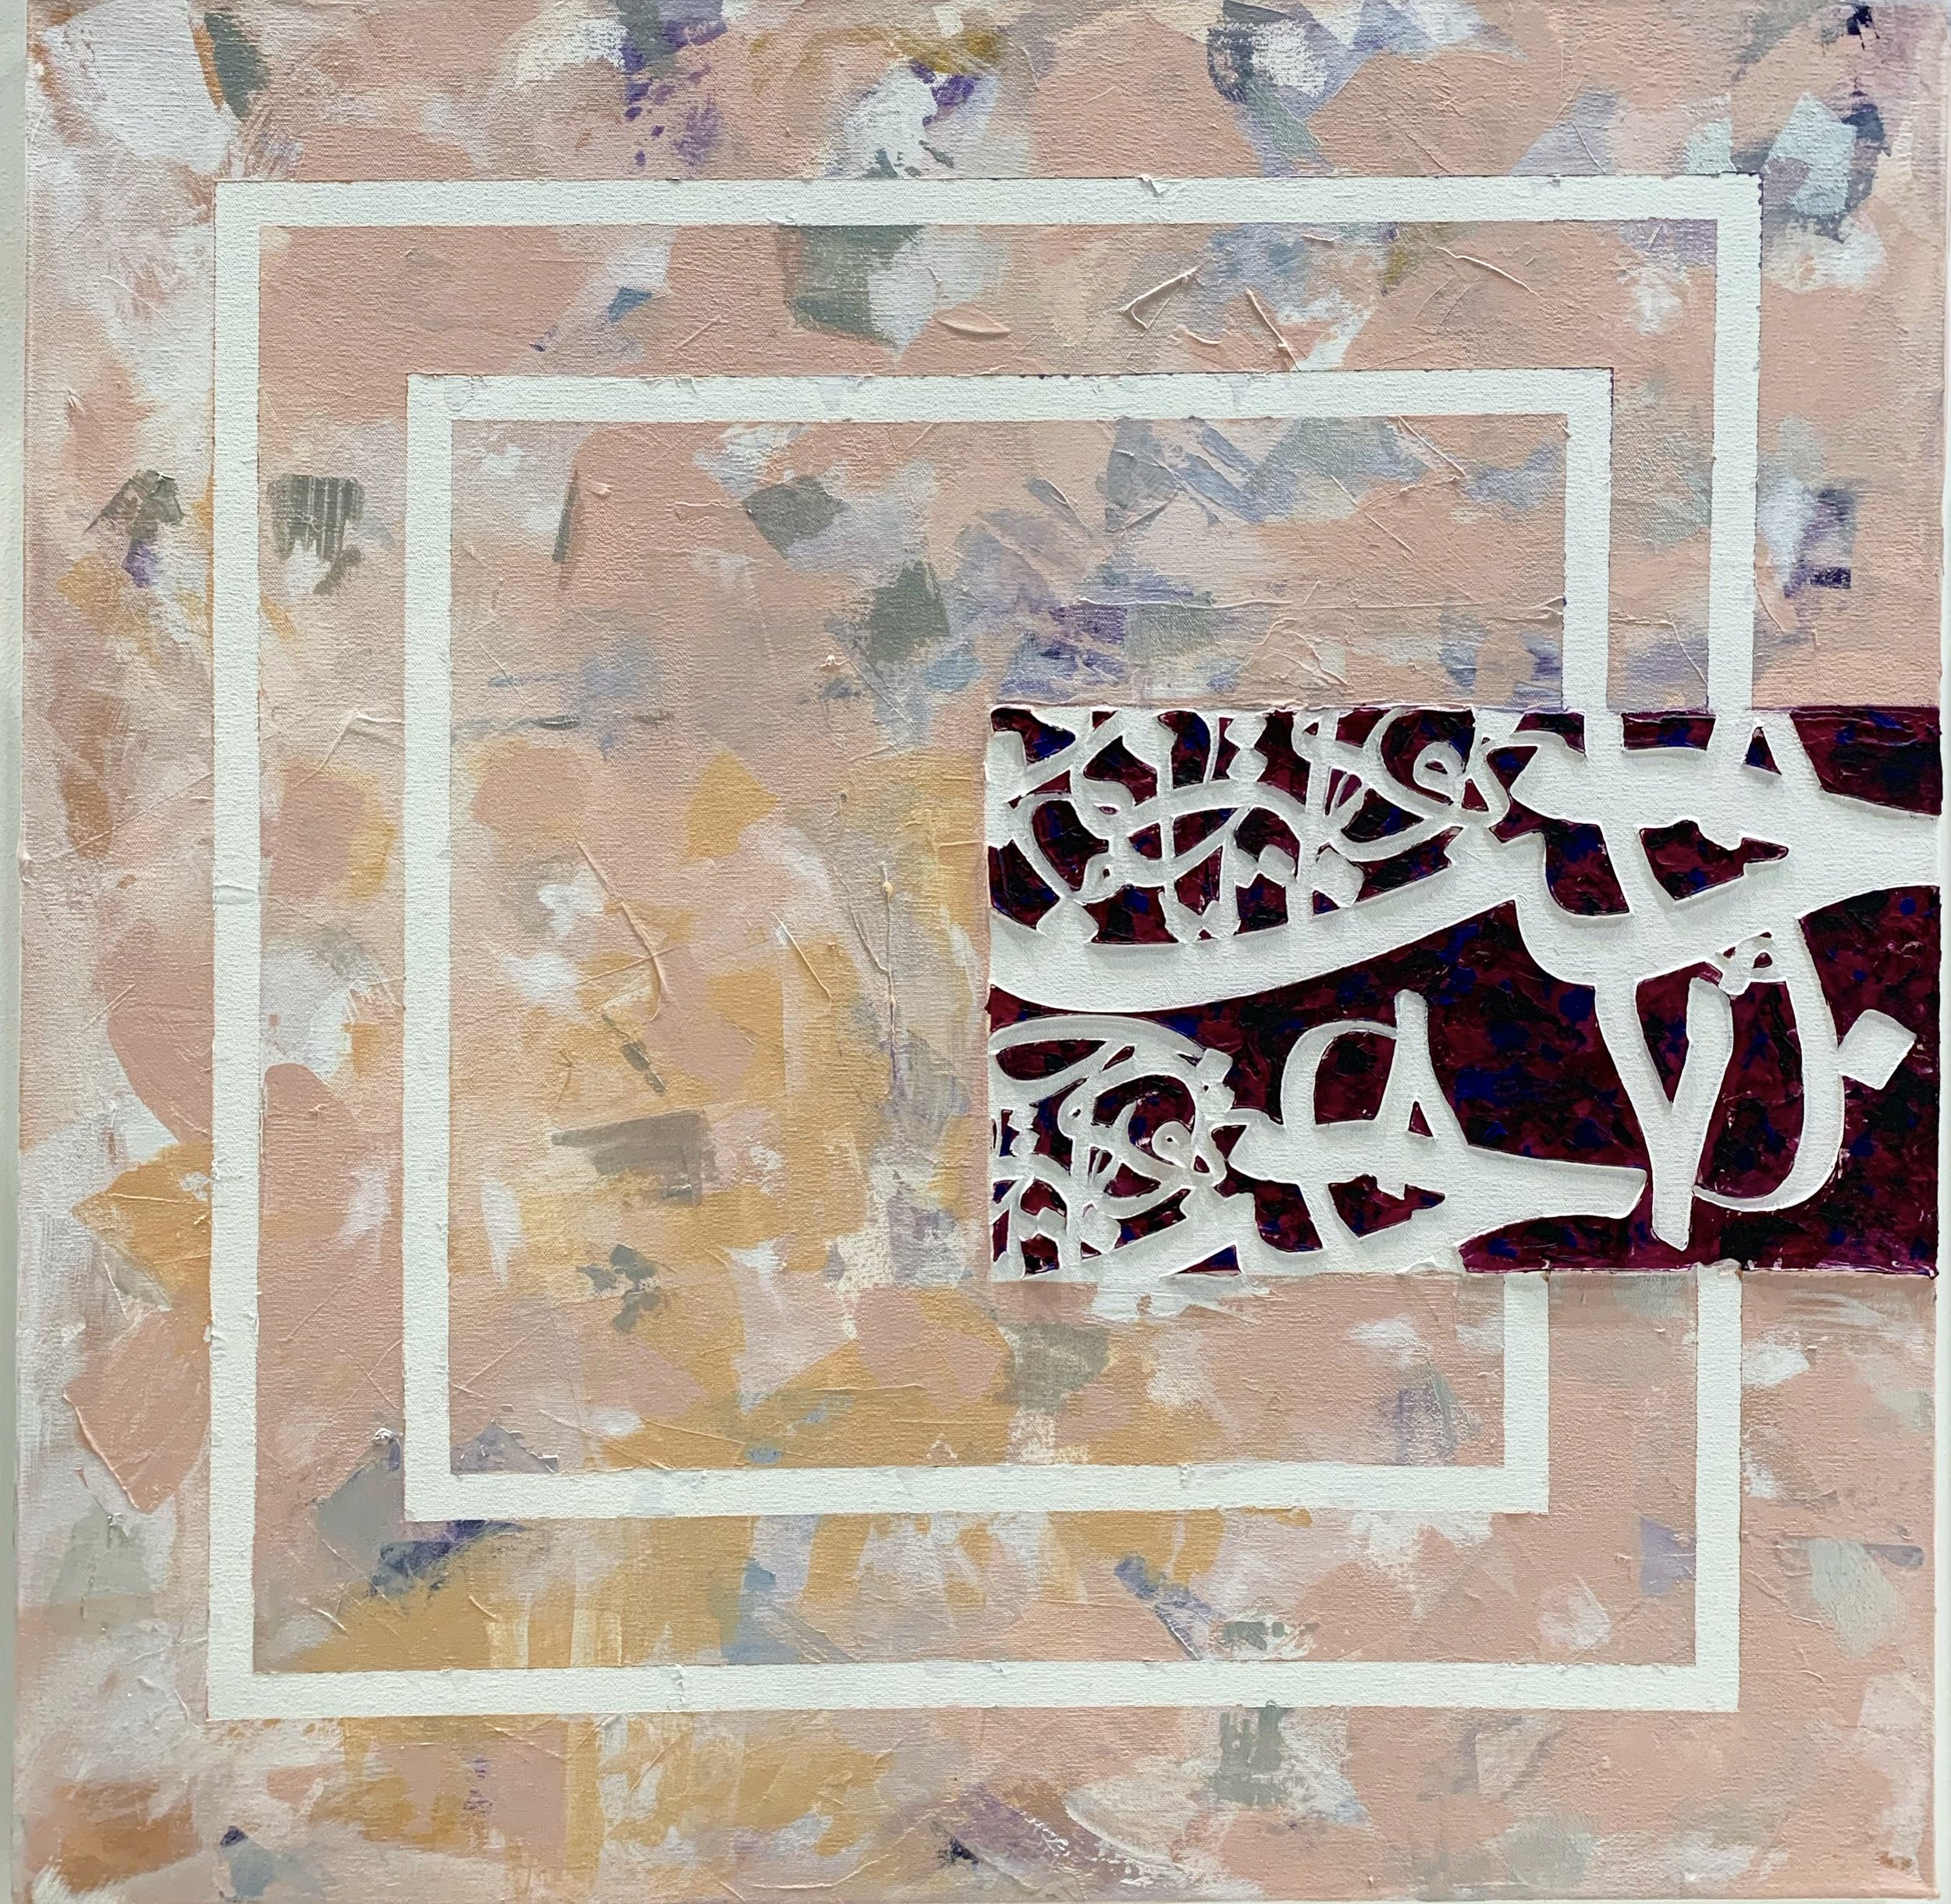 Size: 80*80  Medium: Acrylic on Canvas  Price: 1200